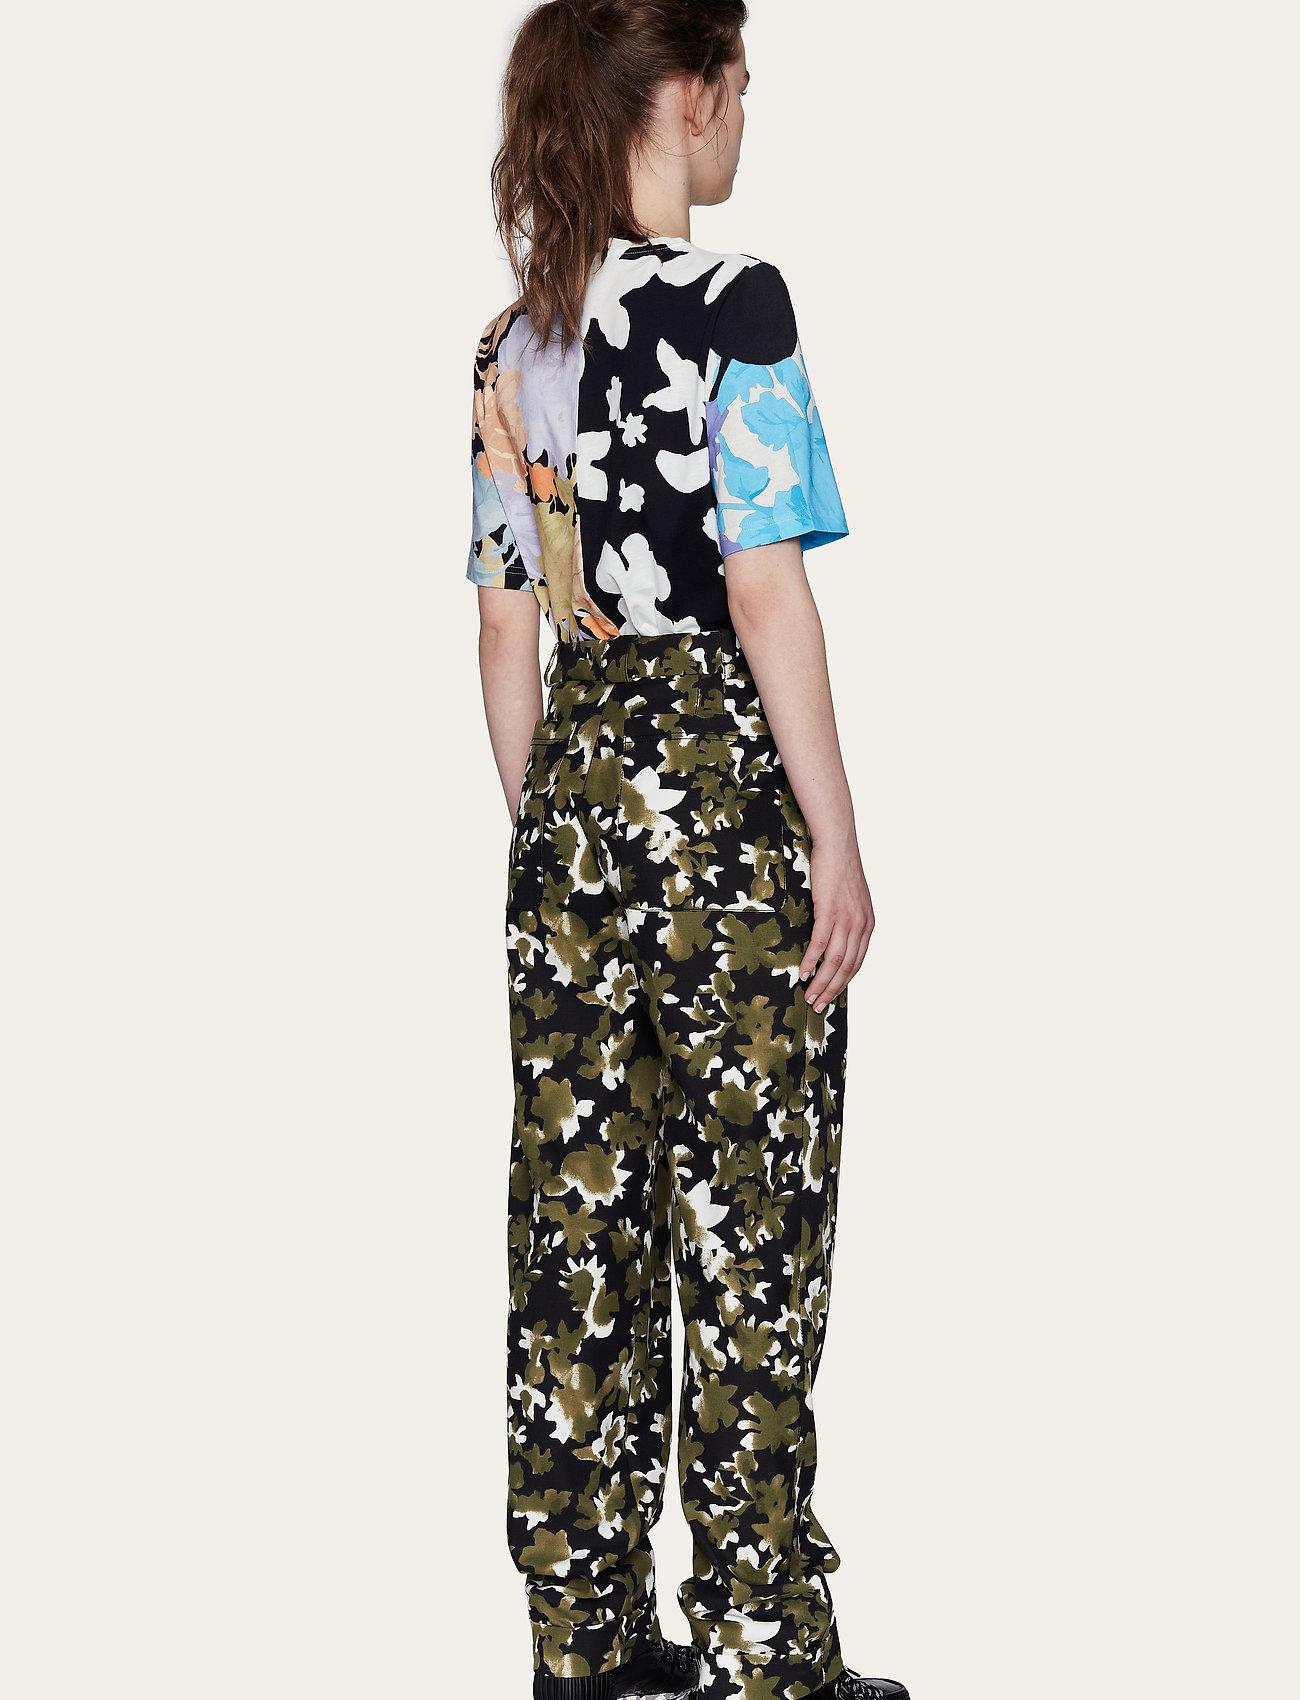 STINE GOYA - Leonie C, 1000 Allover Tee - t-shirts - floral mix - 3